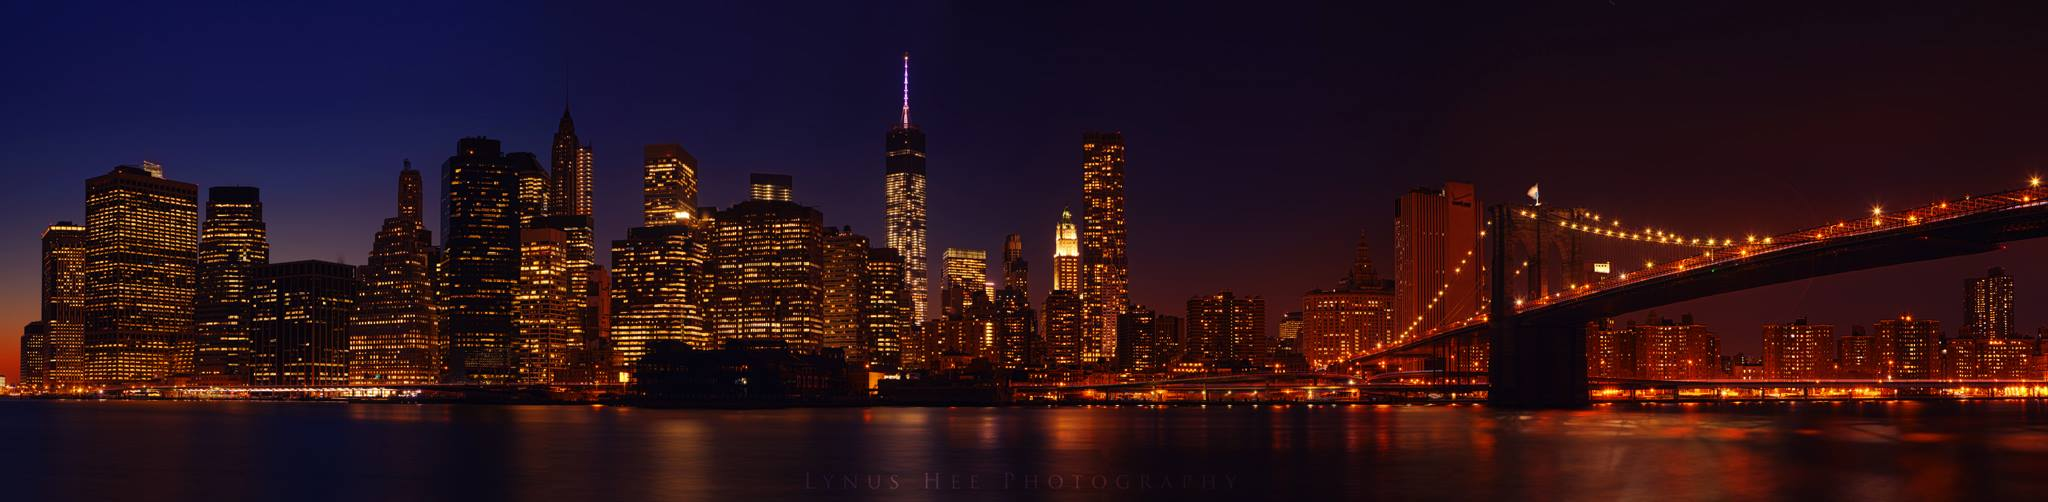 New York Skyline 003.jpg